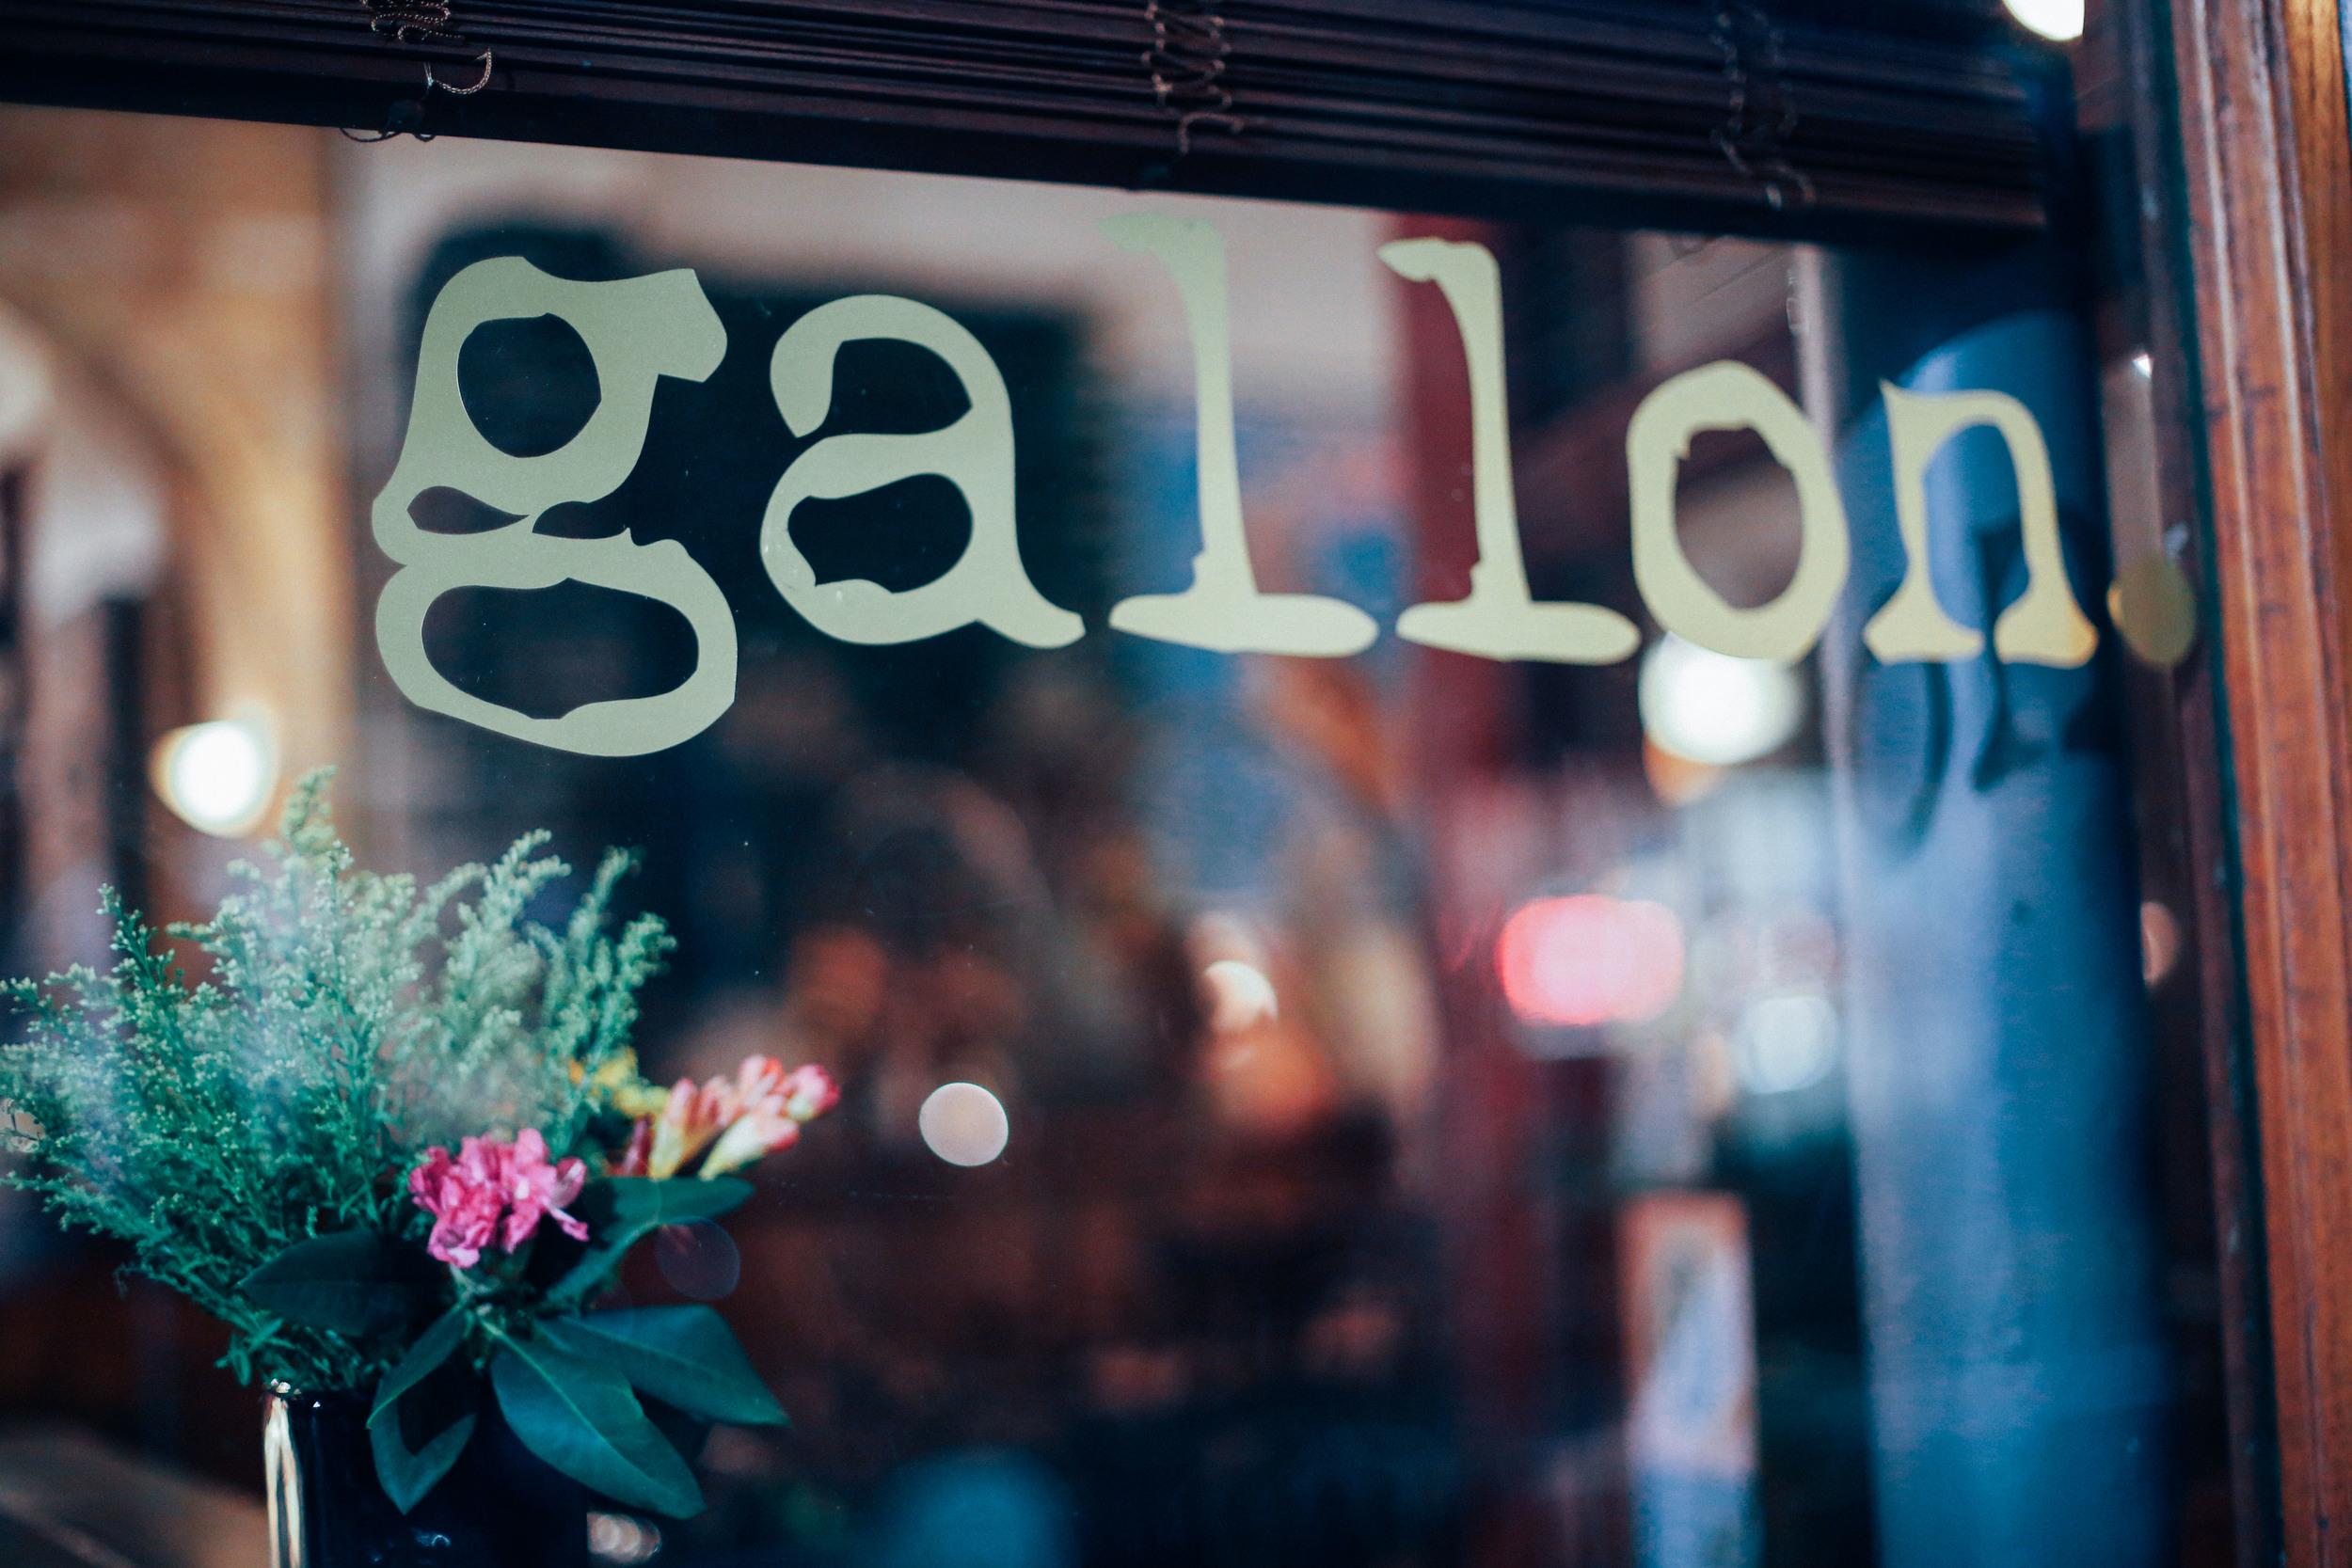 Gallon_Jess Kneebone-72.jpg